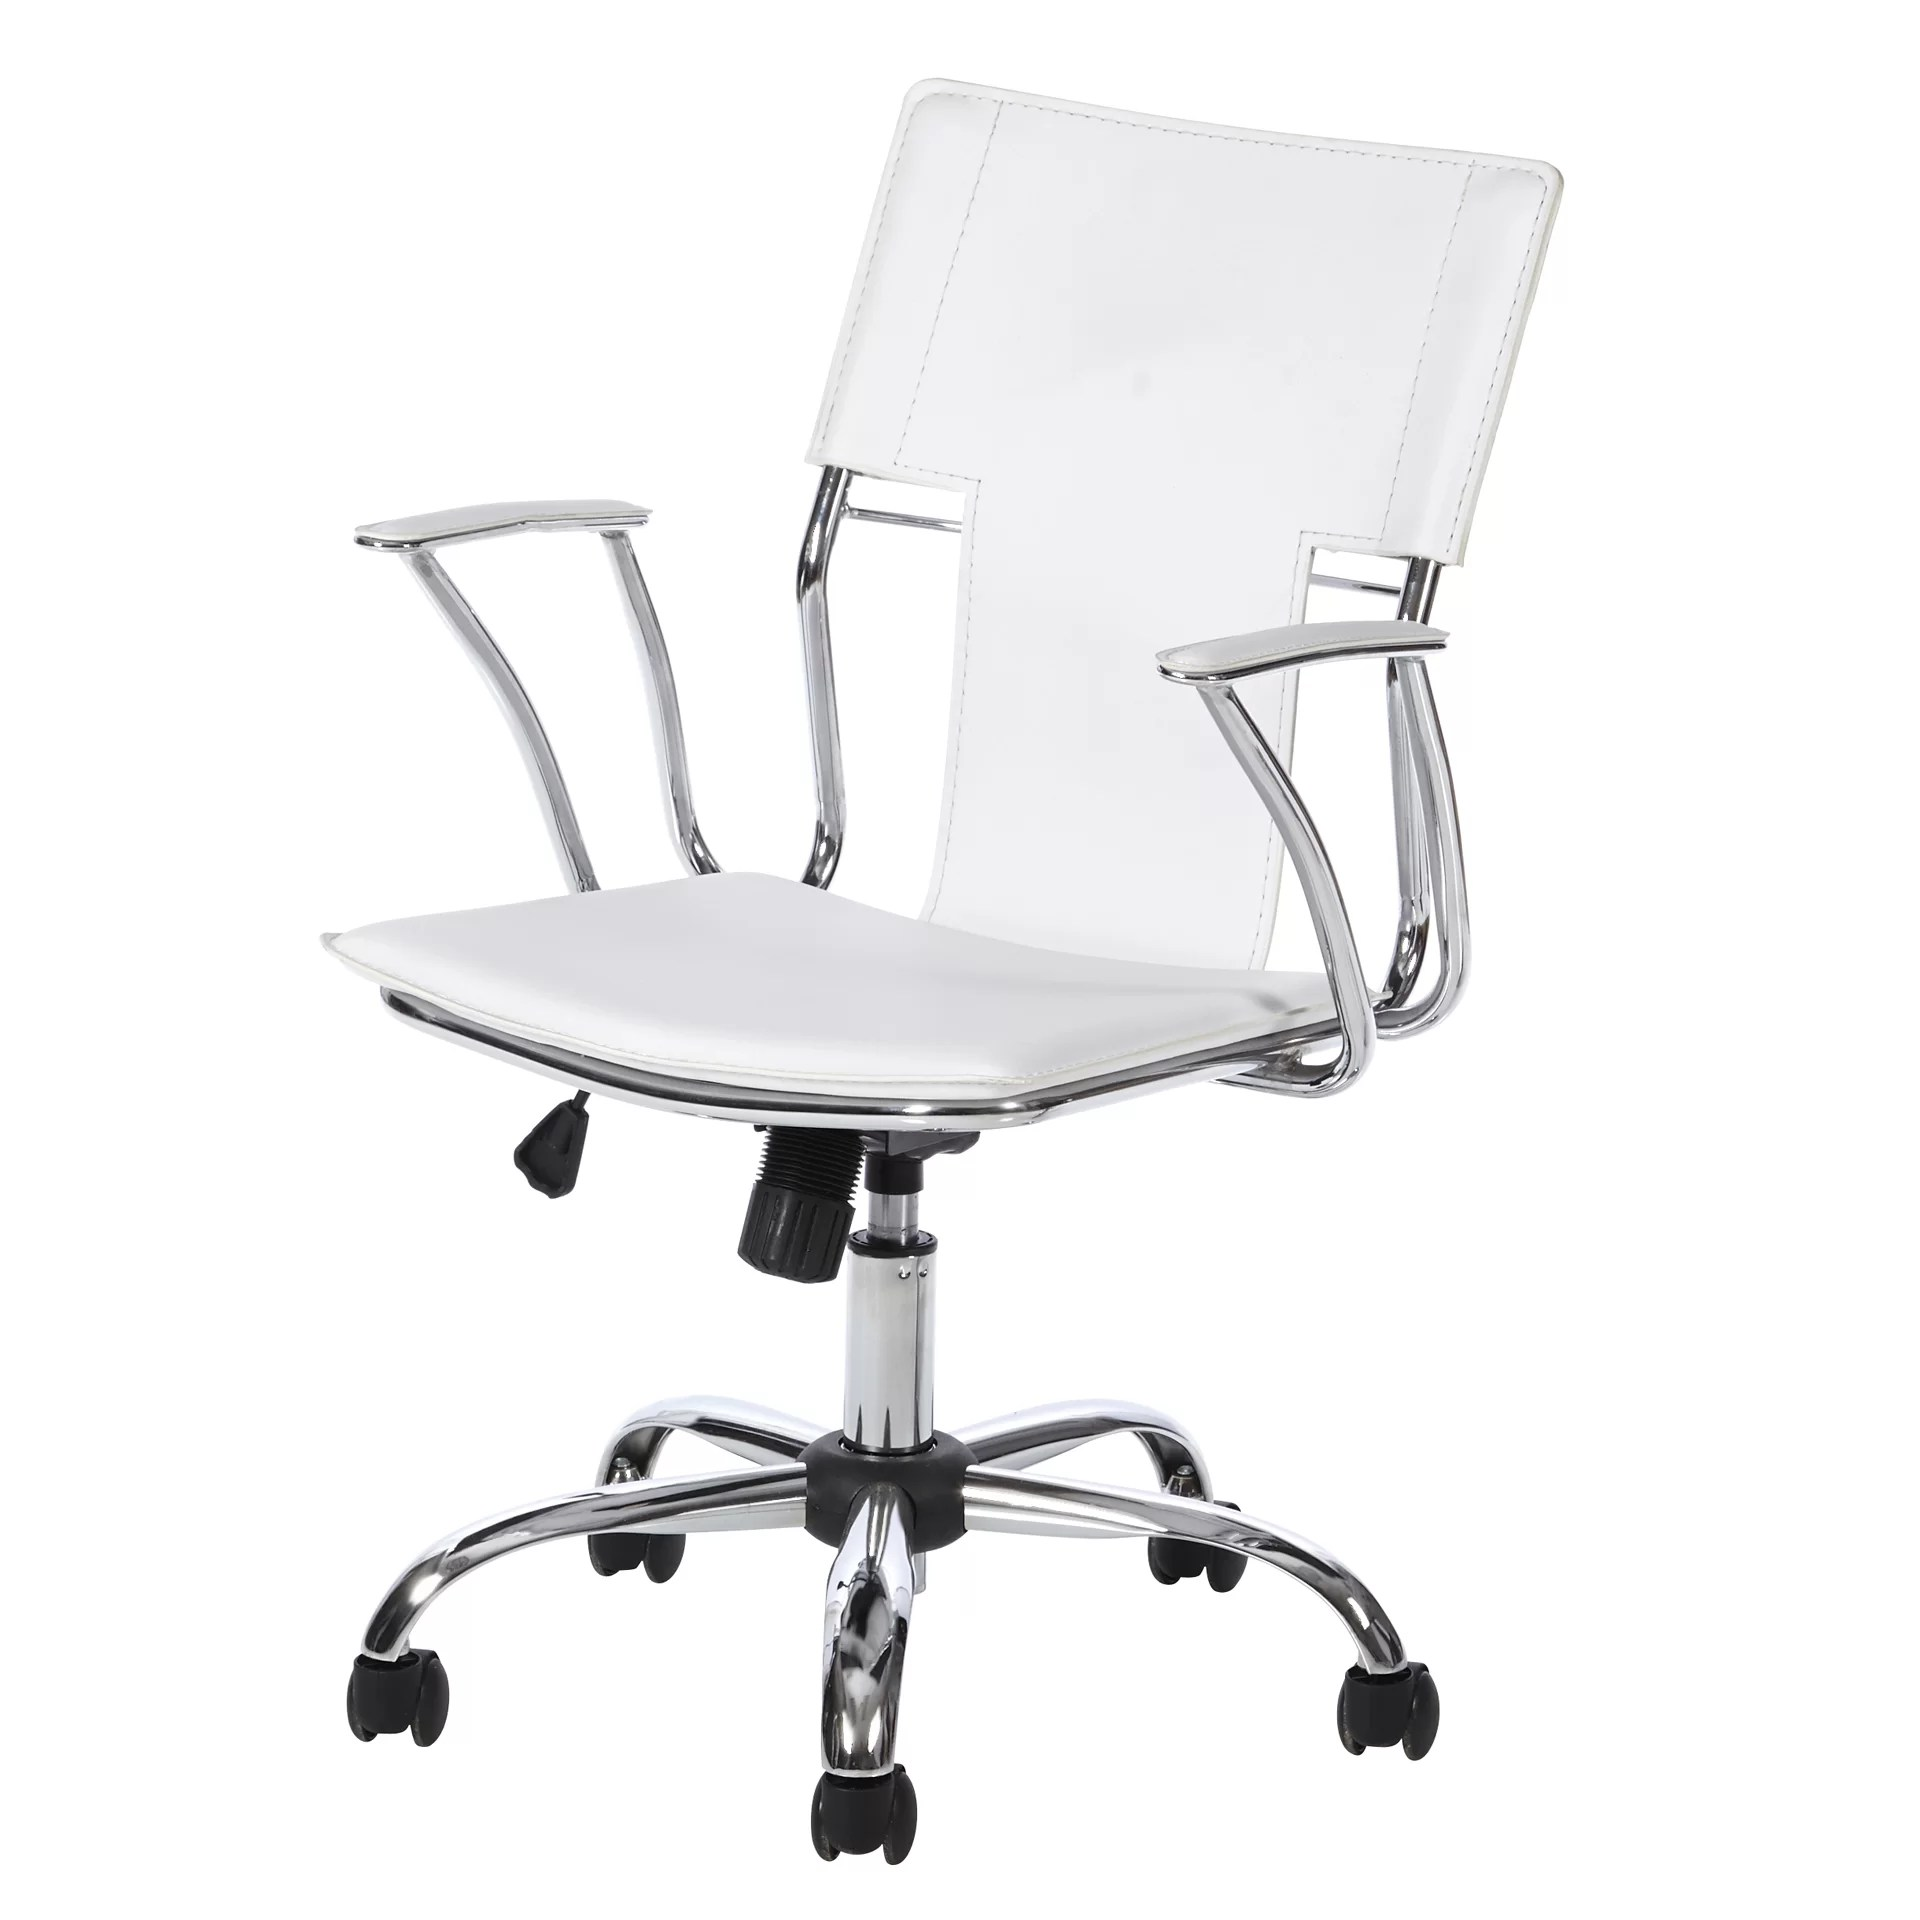 office chair ergonomic sale clear dining chairs uk zipcode design amanda high back